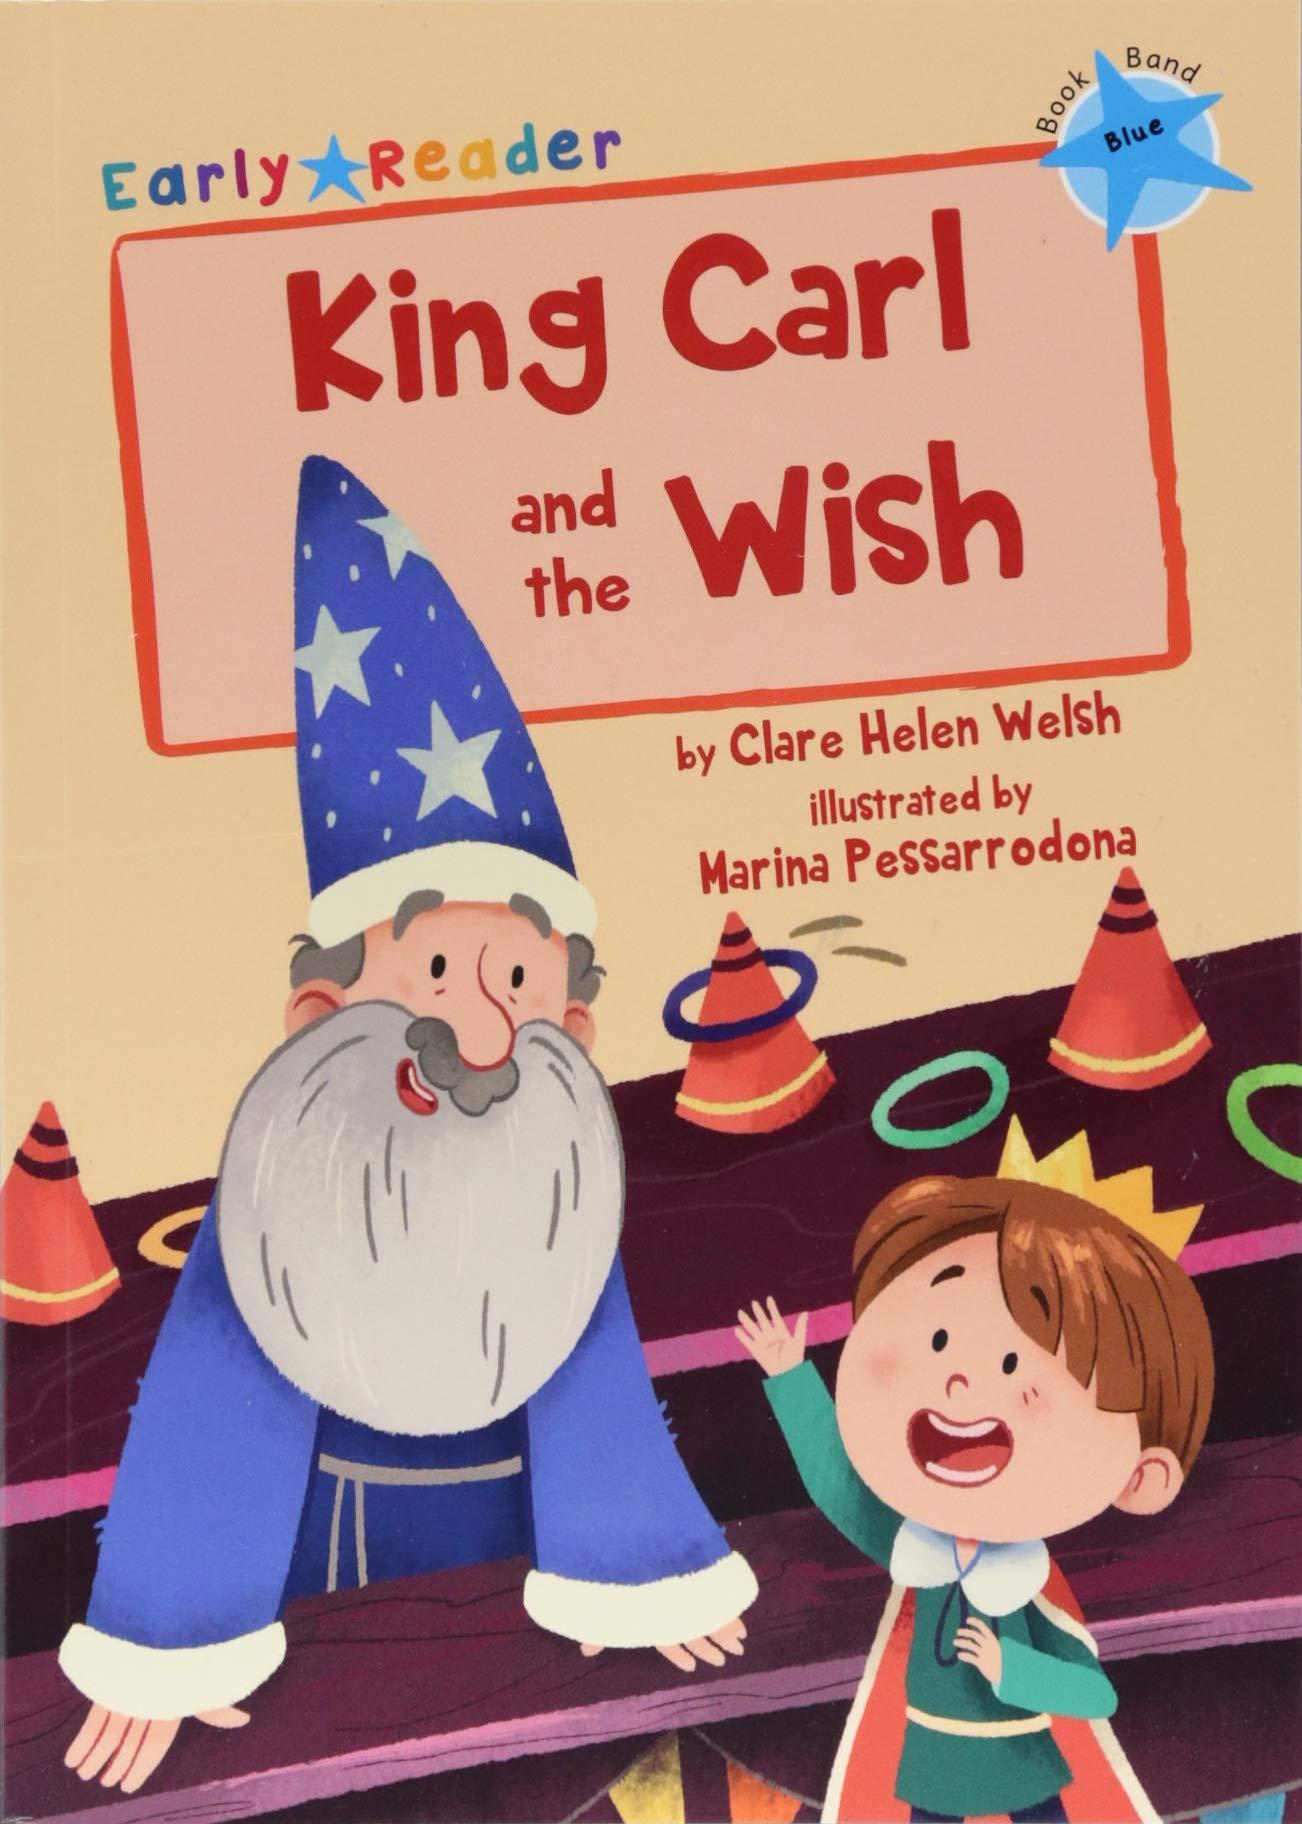 King Carl and the Wish, Maverick Arts Publishing, 2018